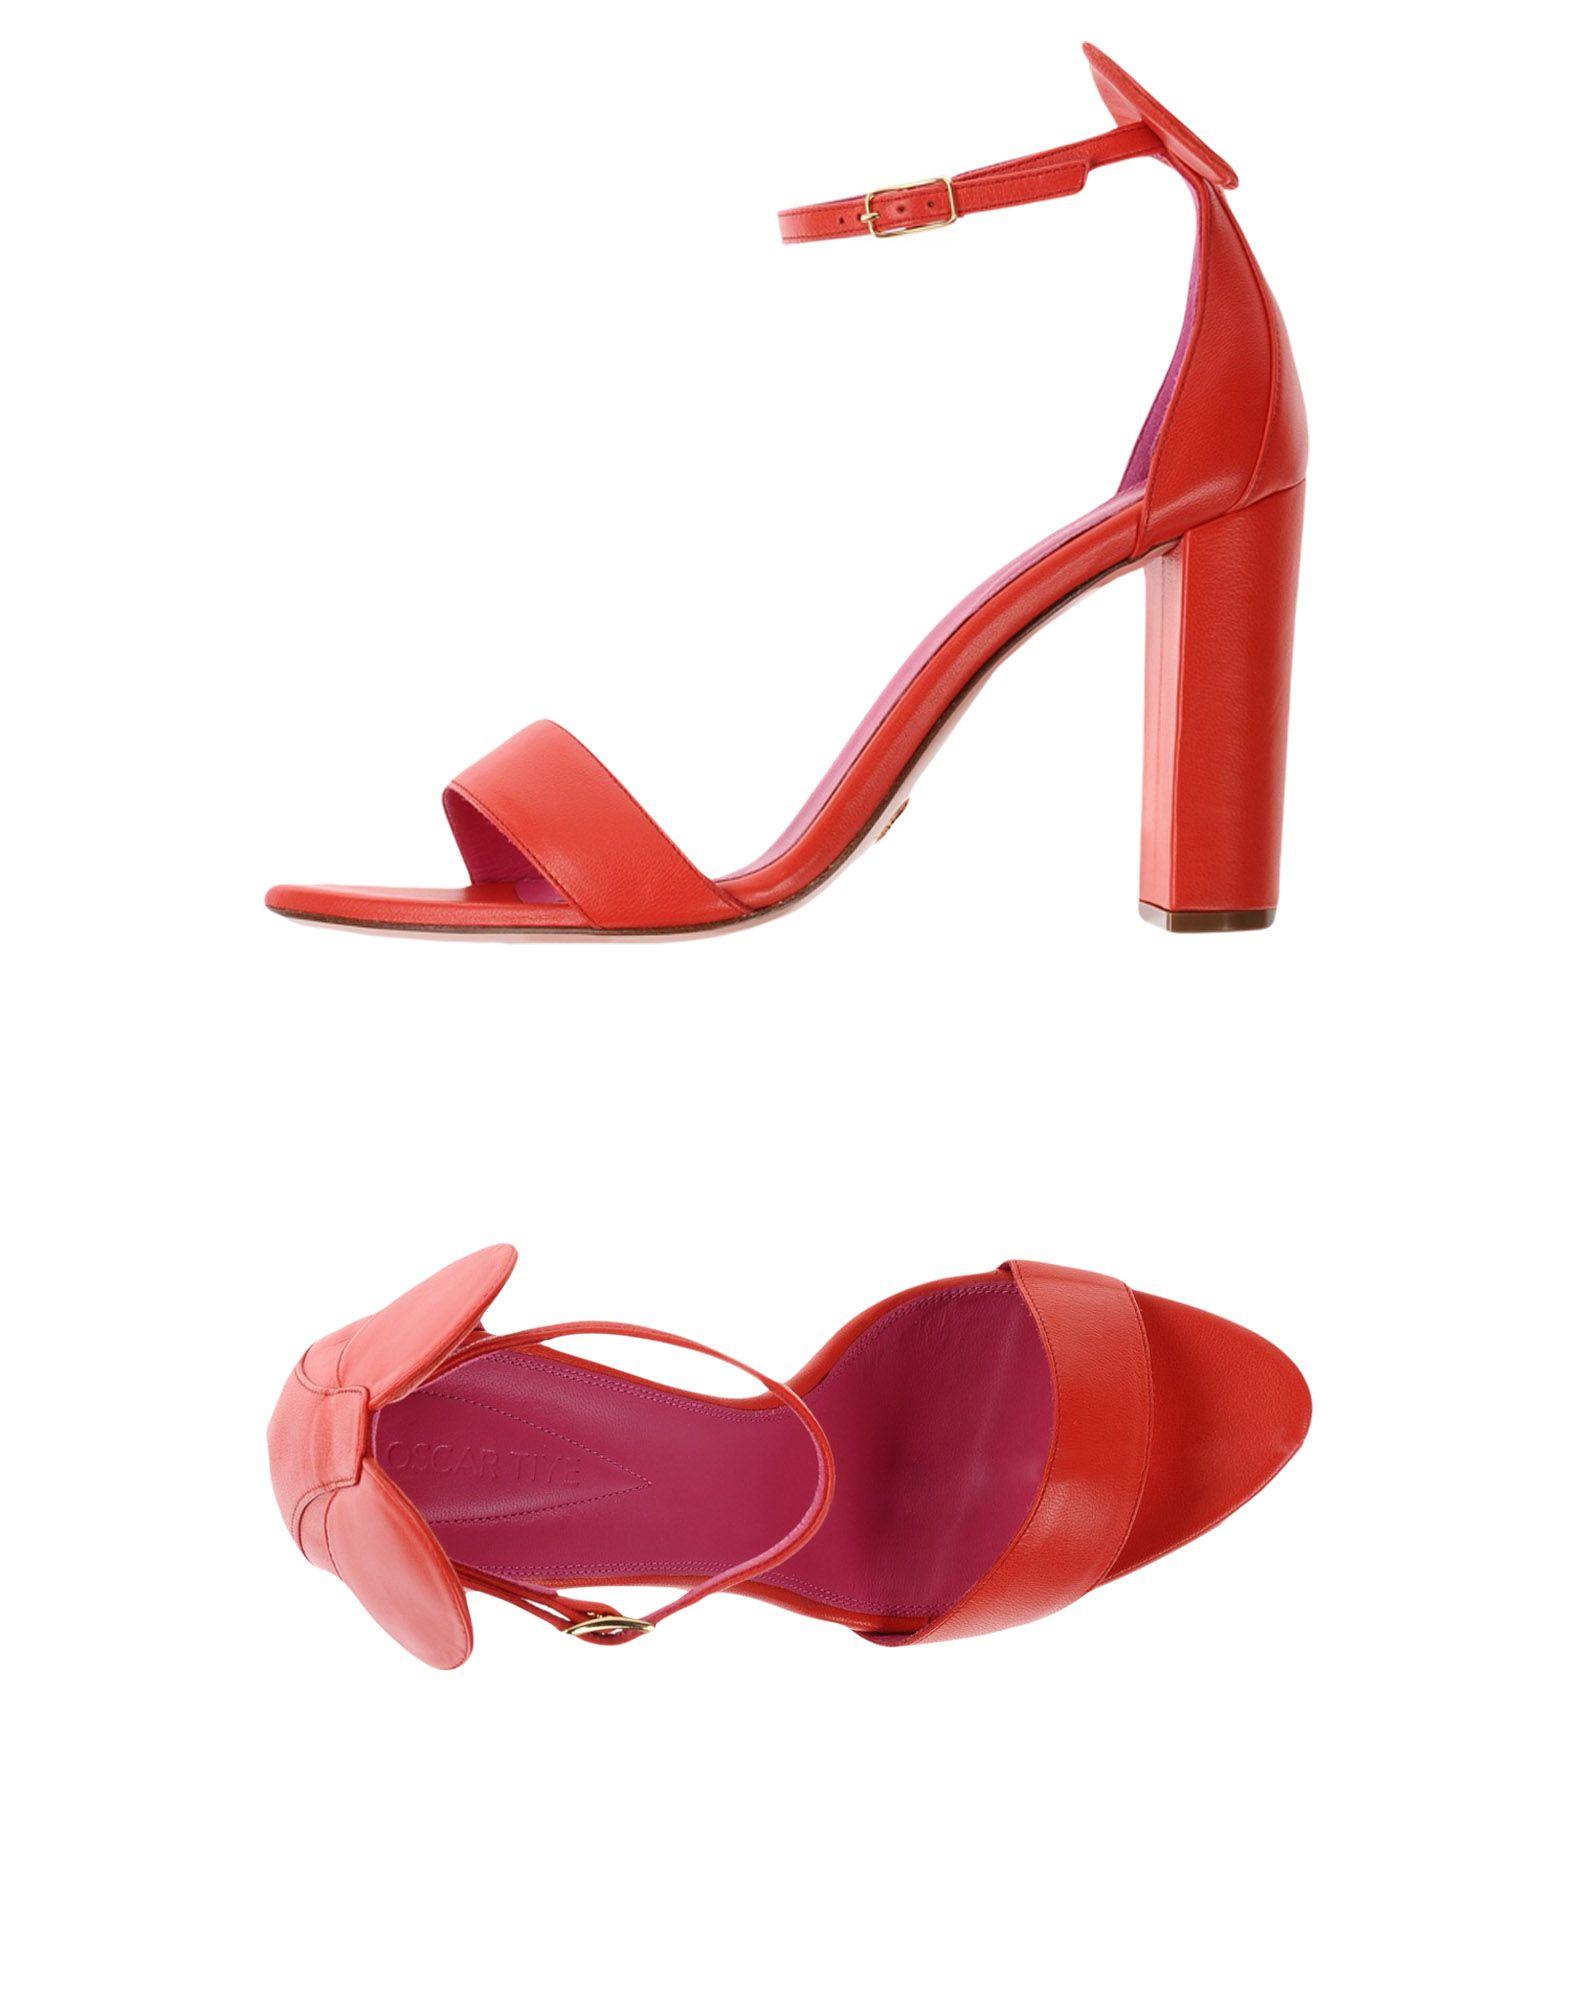 Rabatt Schuhe Oscar Tiye Sandalen Damen  11340967QW